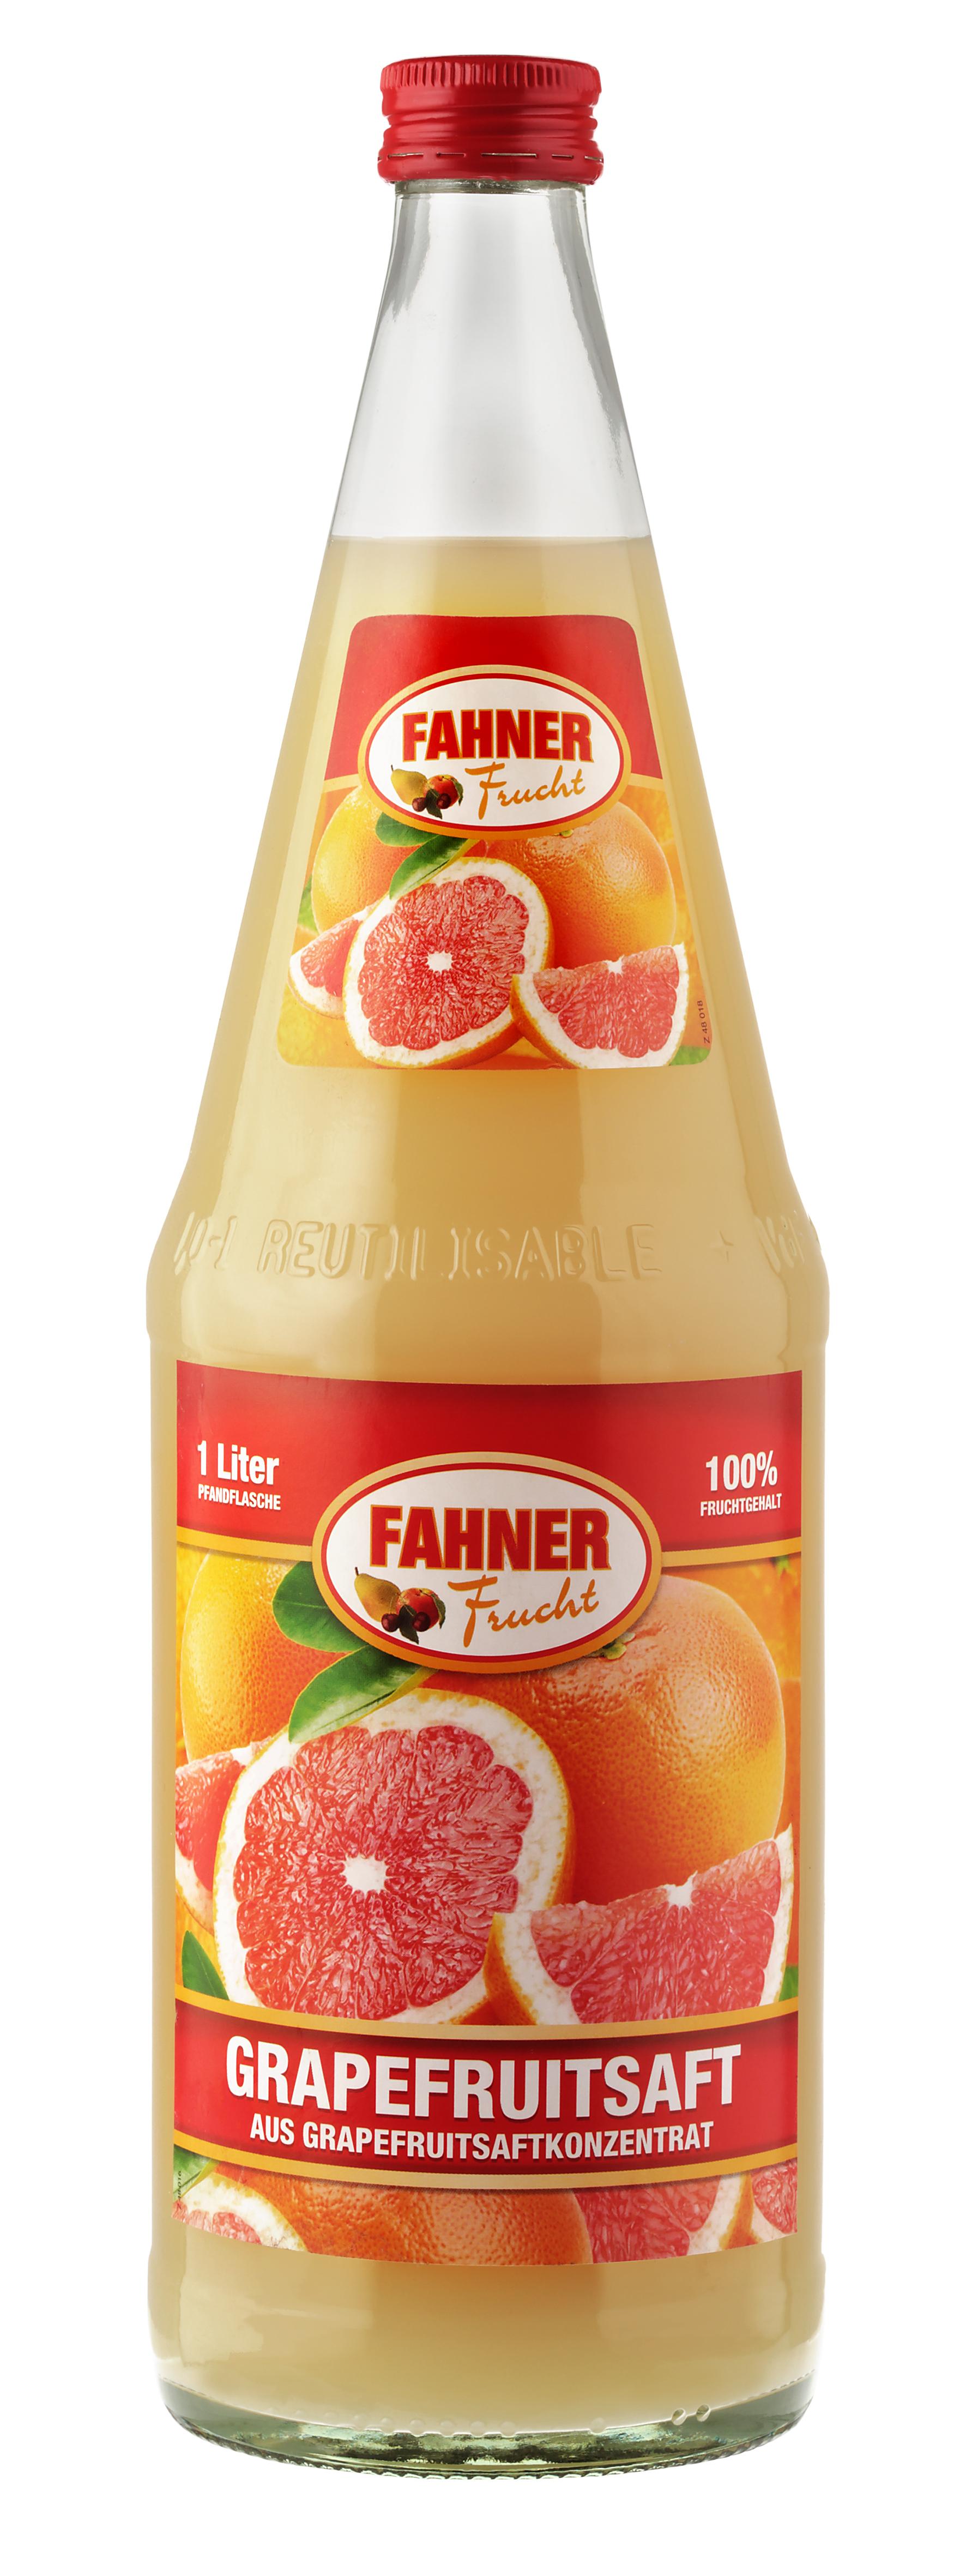 FAHNER Grapefruitsaft 6x1 l